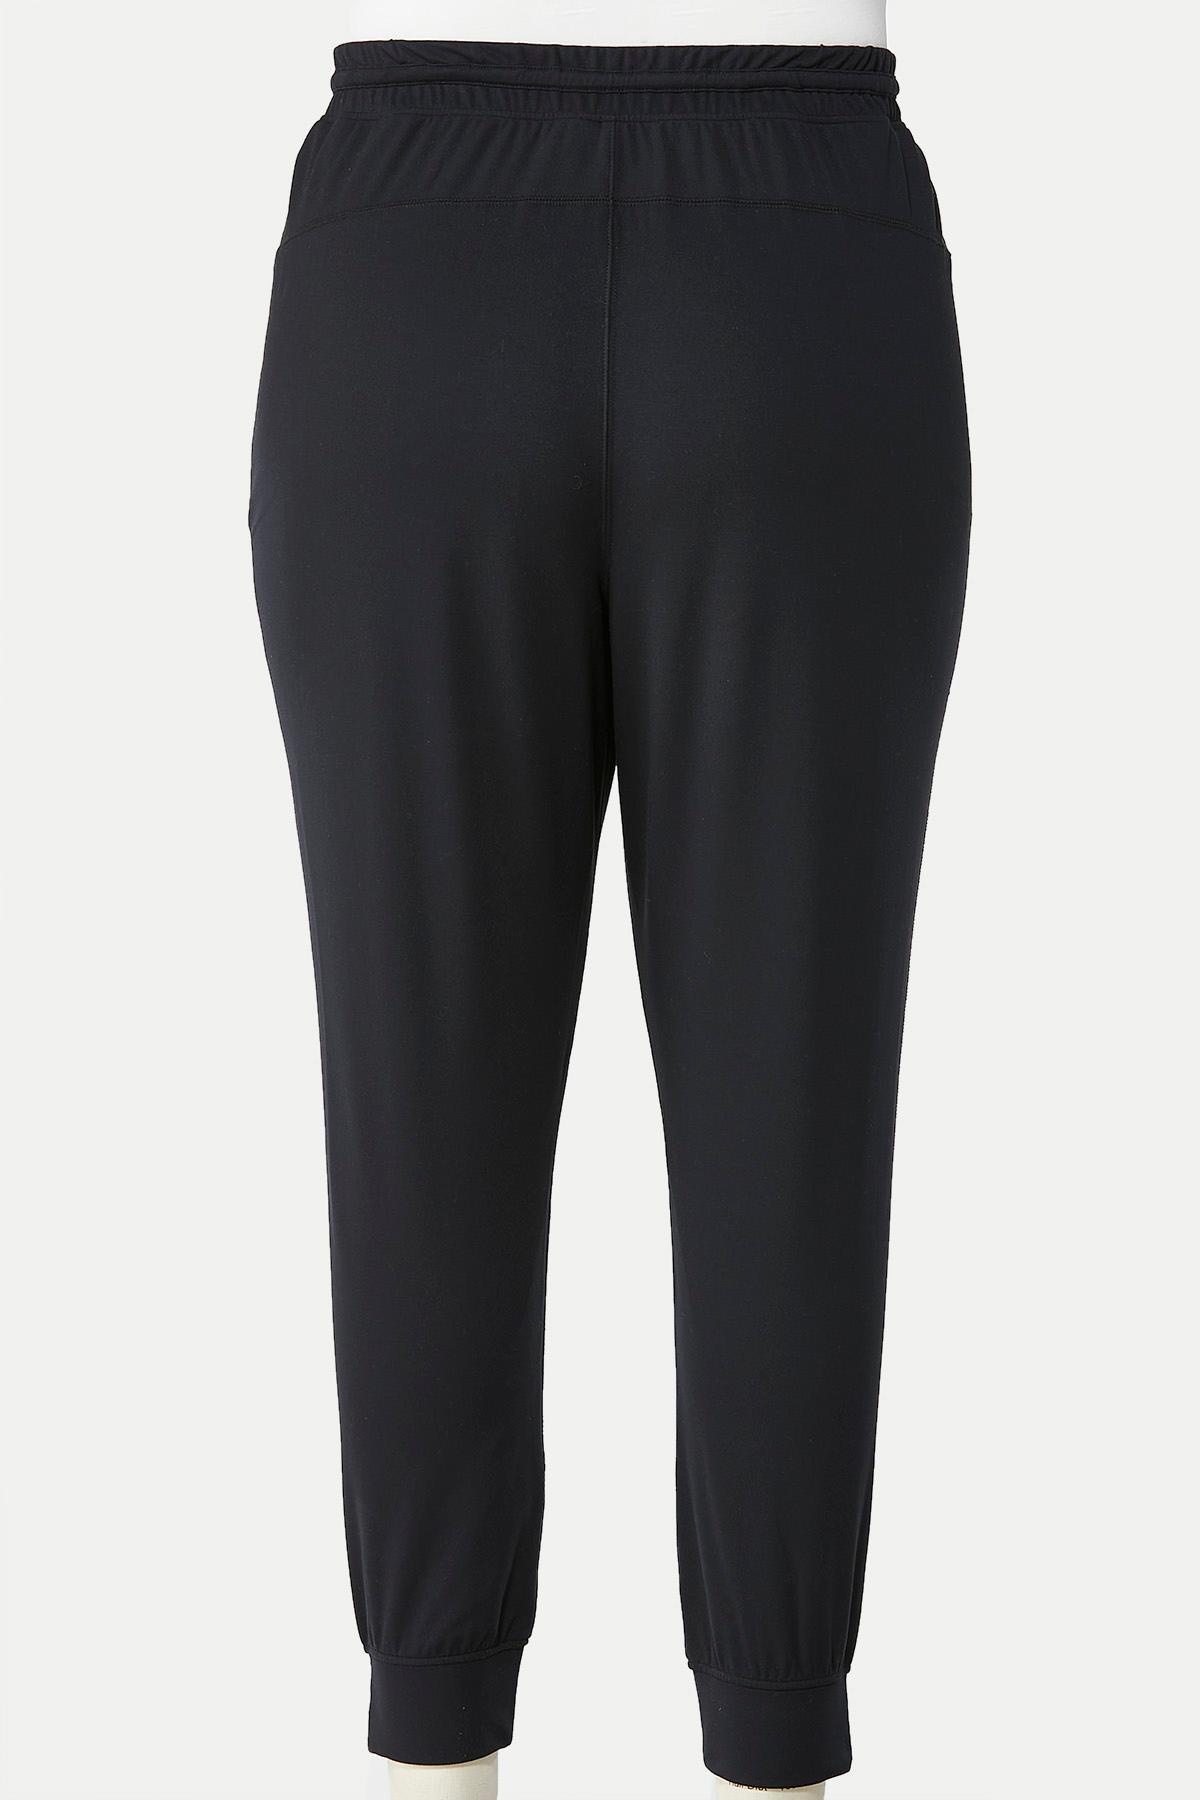 Plus Size Soft Drawstring Joggers (Item #44662023)